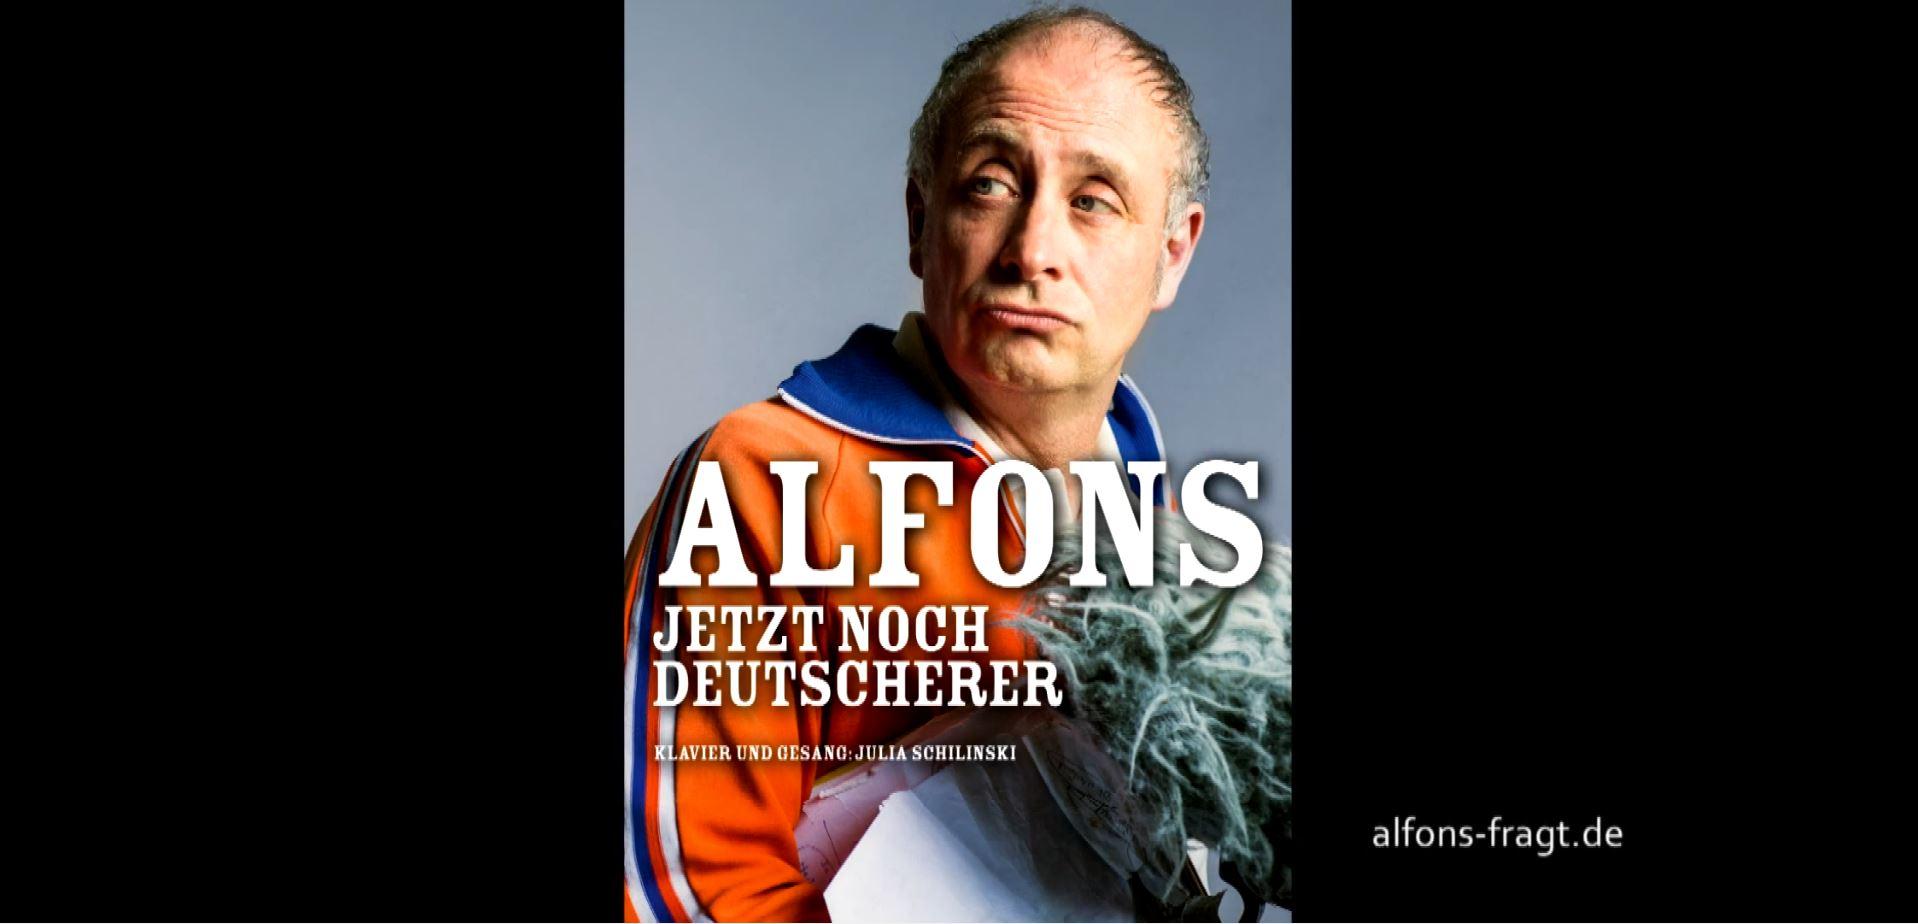 Alfons Jetzt Noch Deutscherer